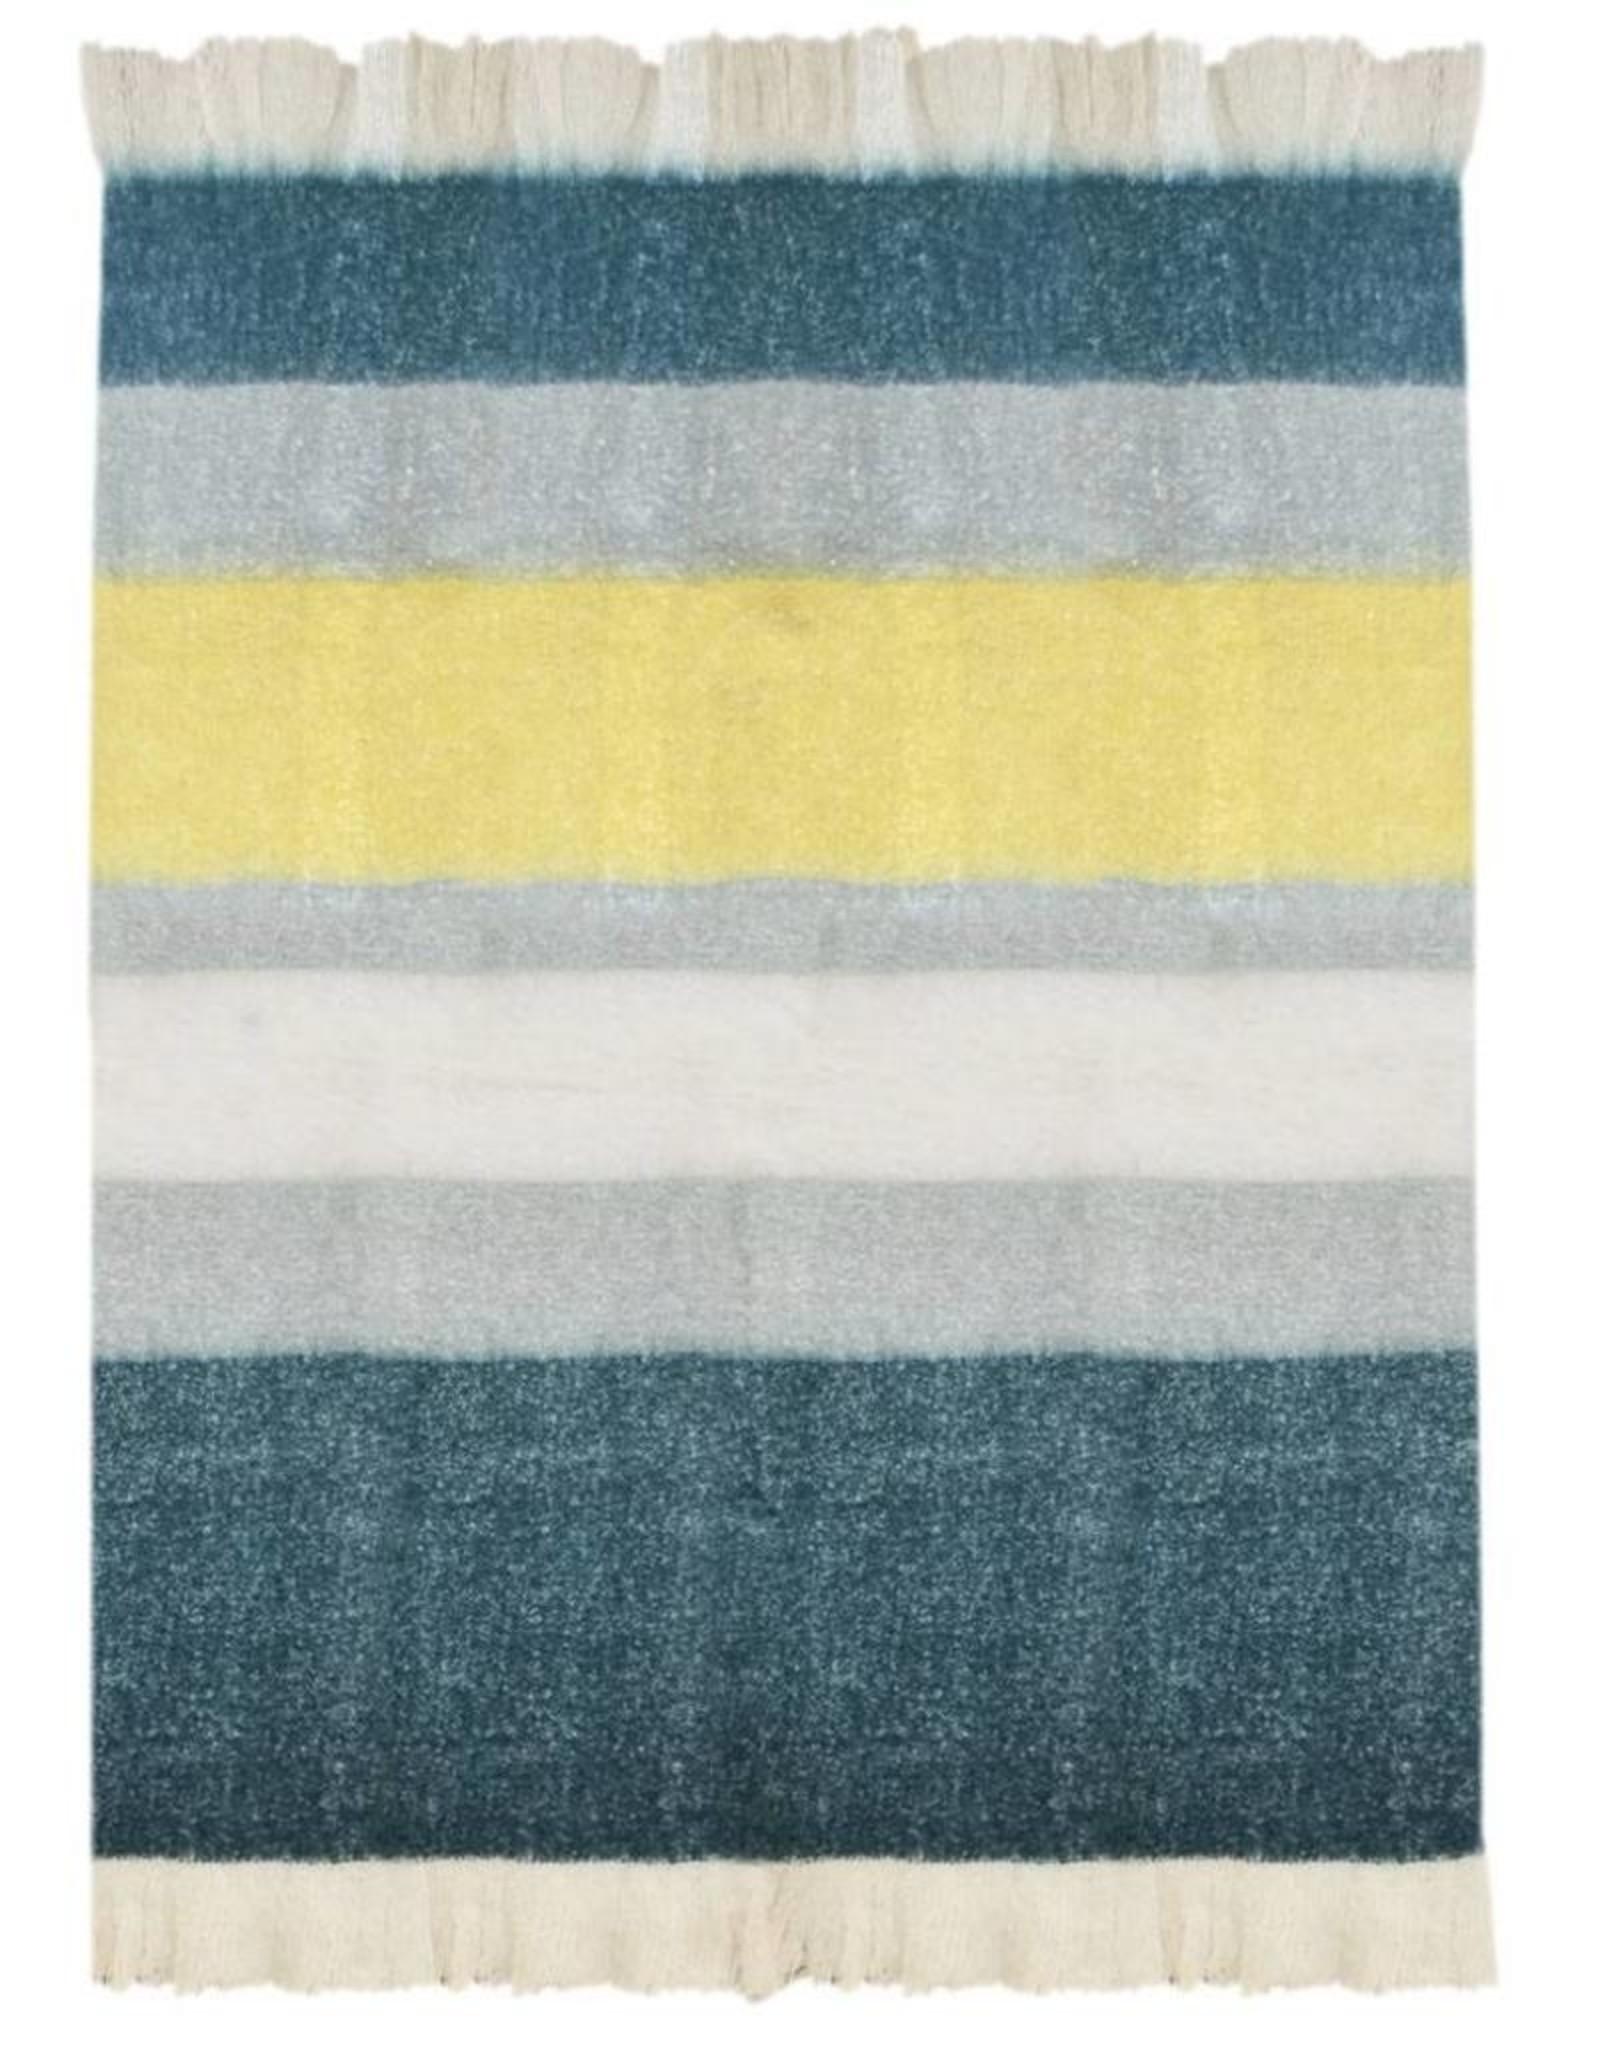 Plaid Soft Blauw/Grijs/Geel